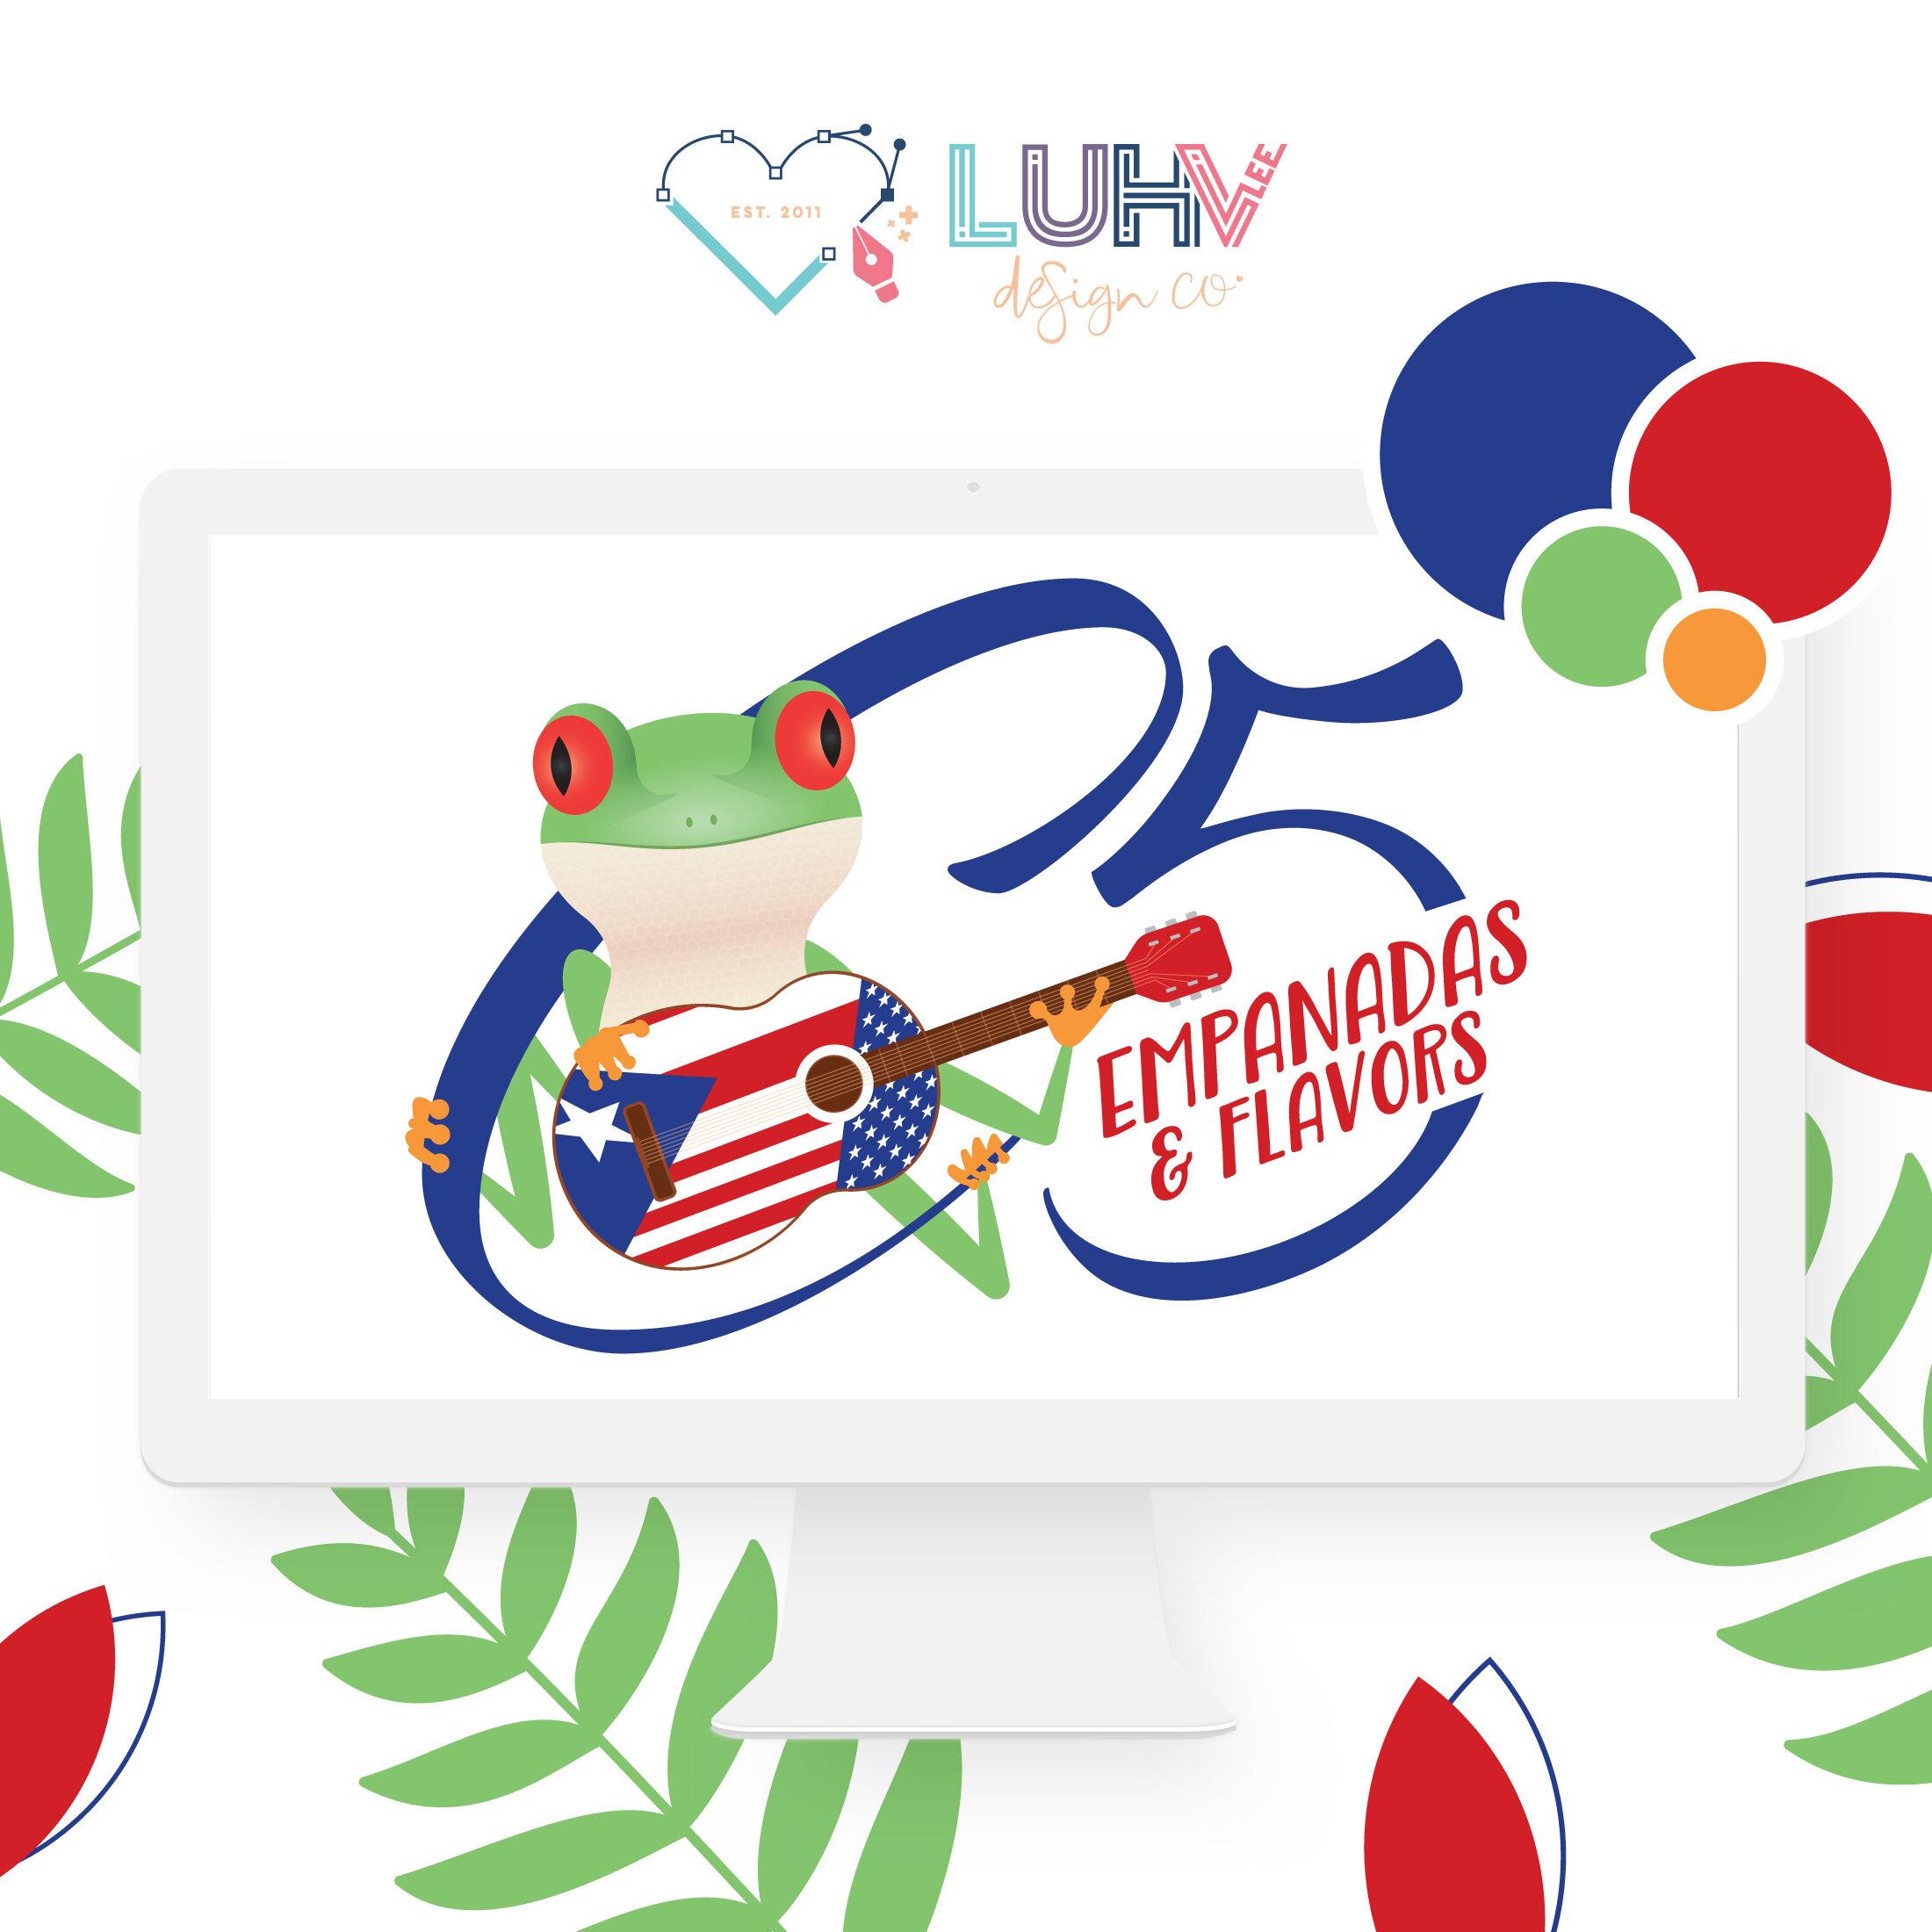 C5 Empanadas & Flavors Logo Design by Luhv'lee Design Company